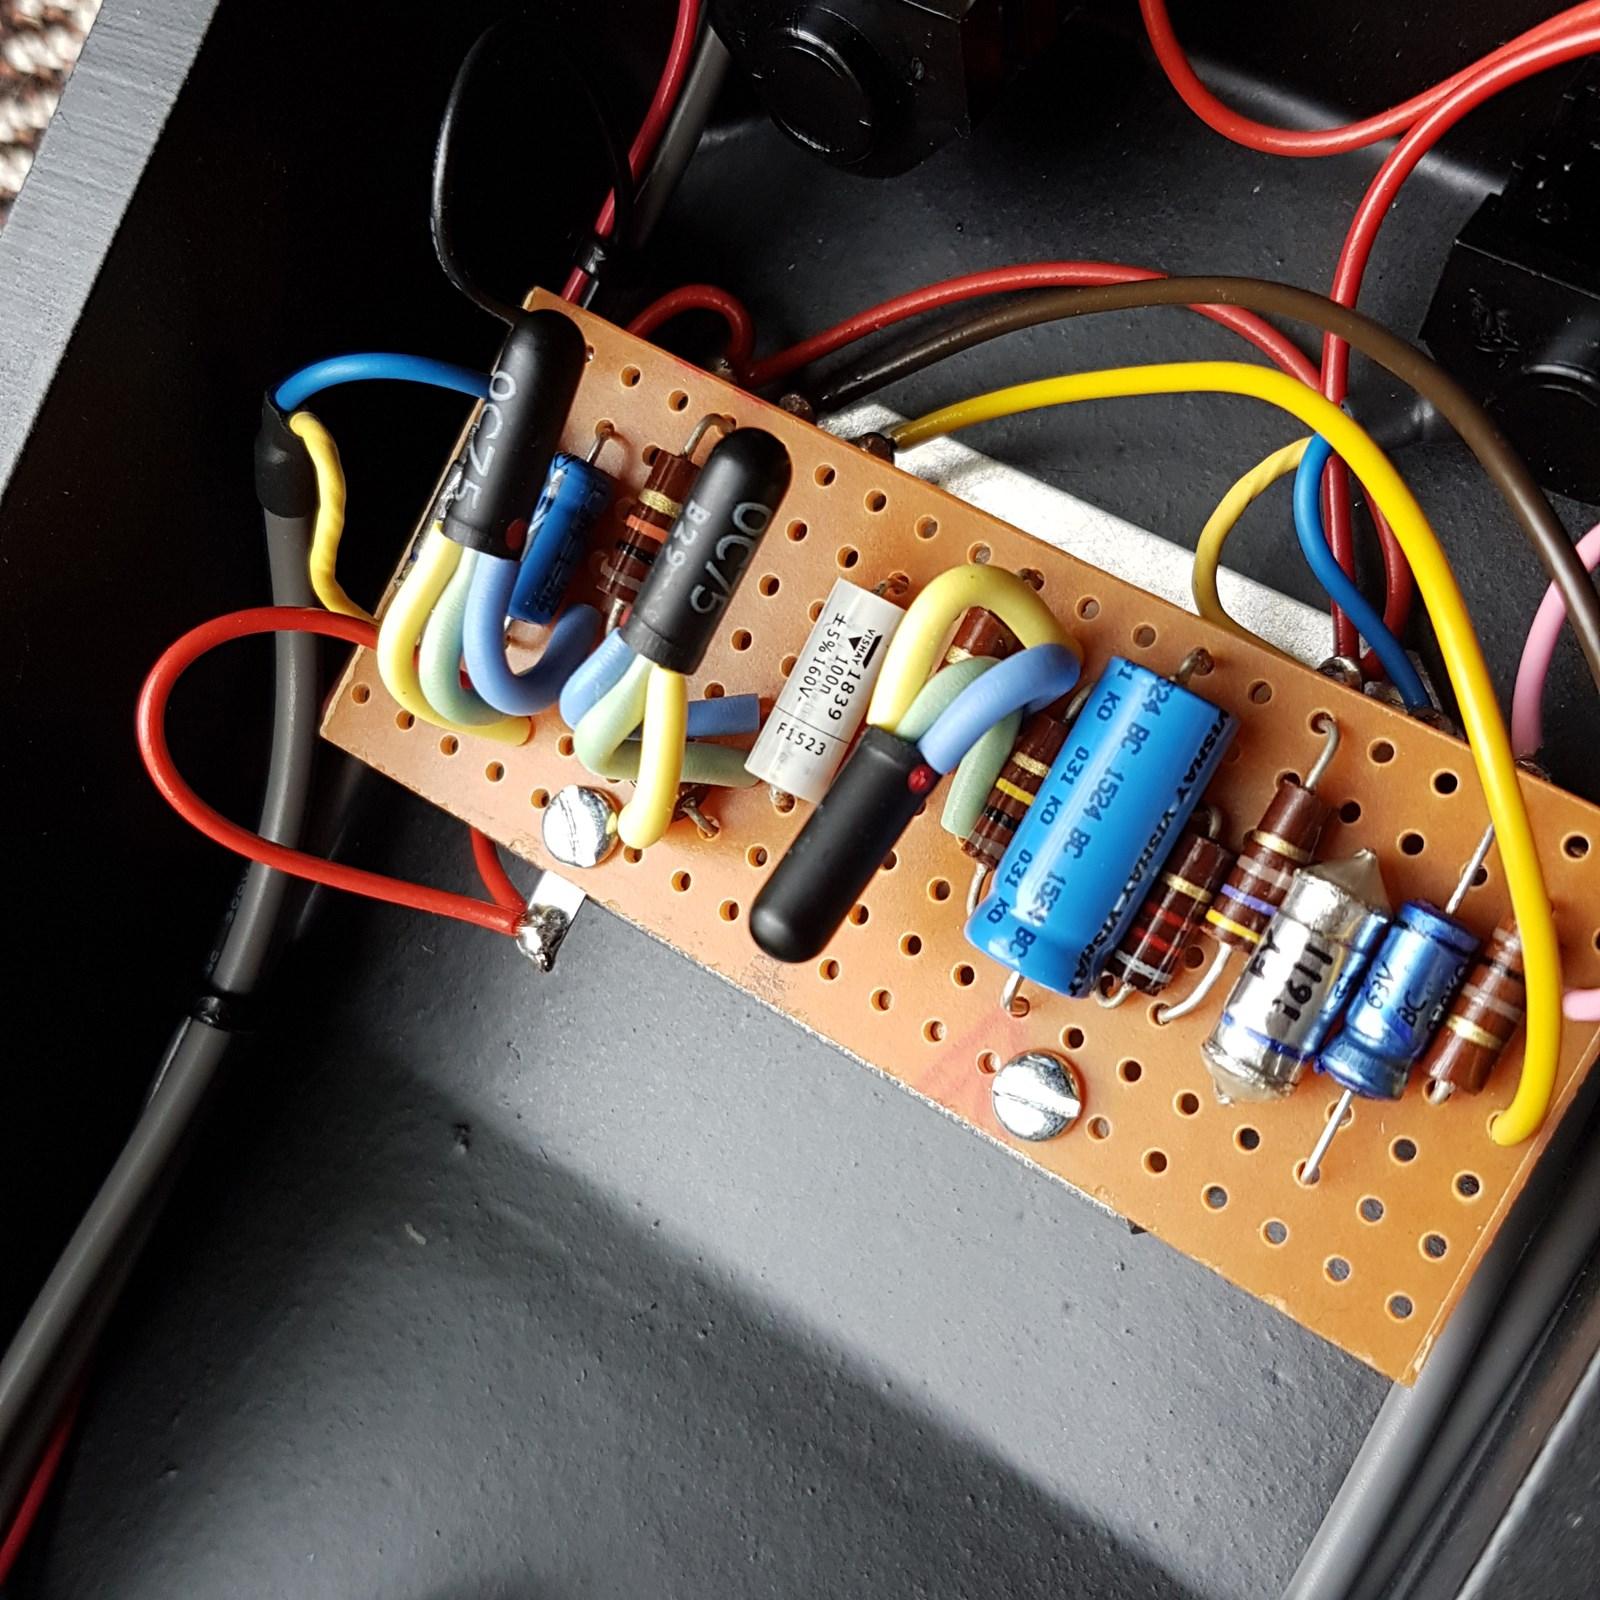 Sola Sound Pro Mkii Tone Bender Vox Pedal Mkiisquare01 Mkiisquare02 Mkiisquare03